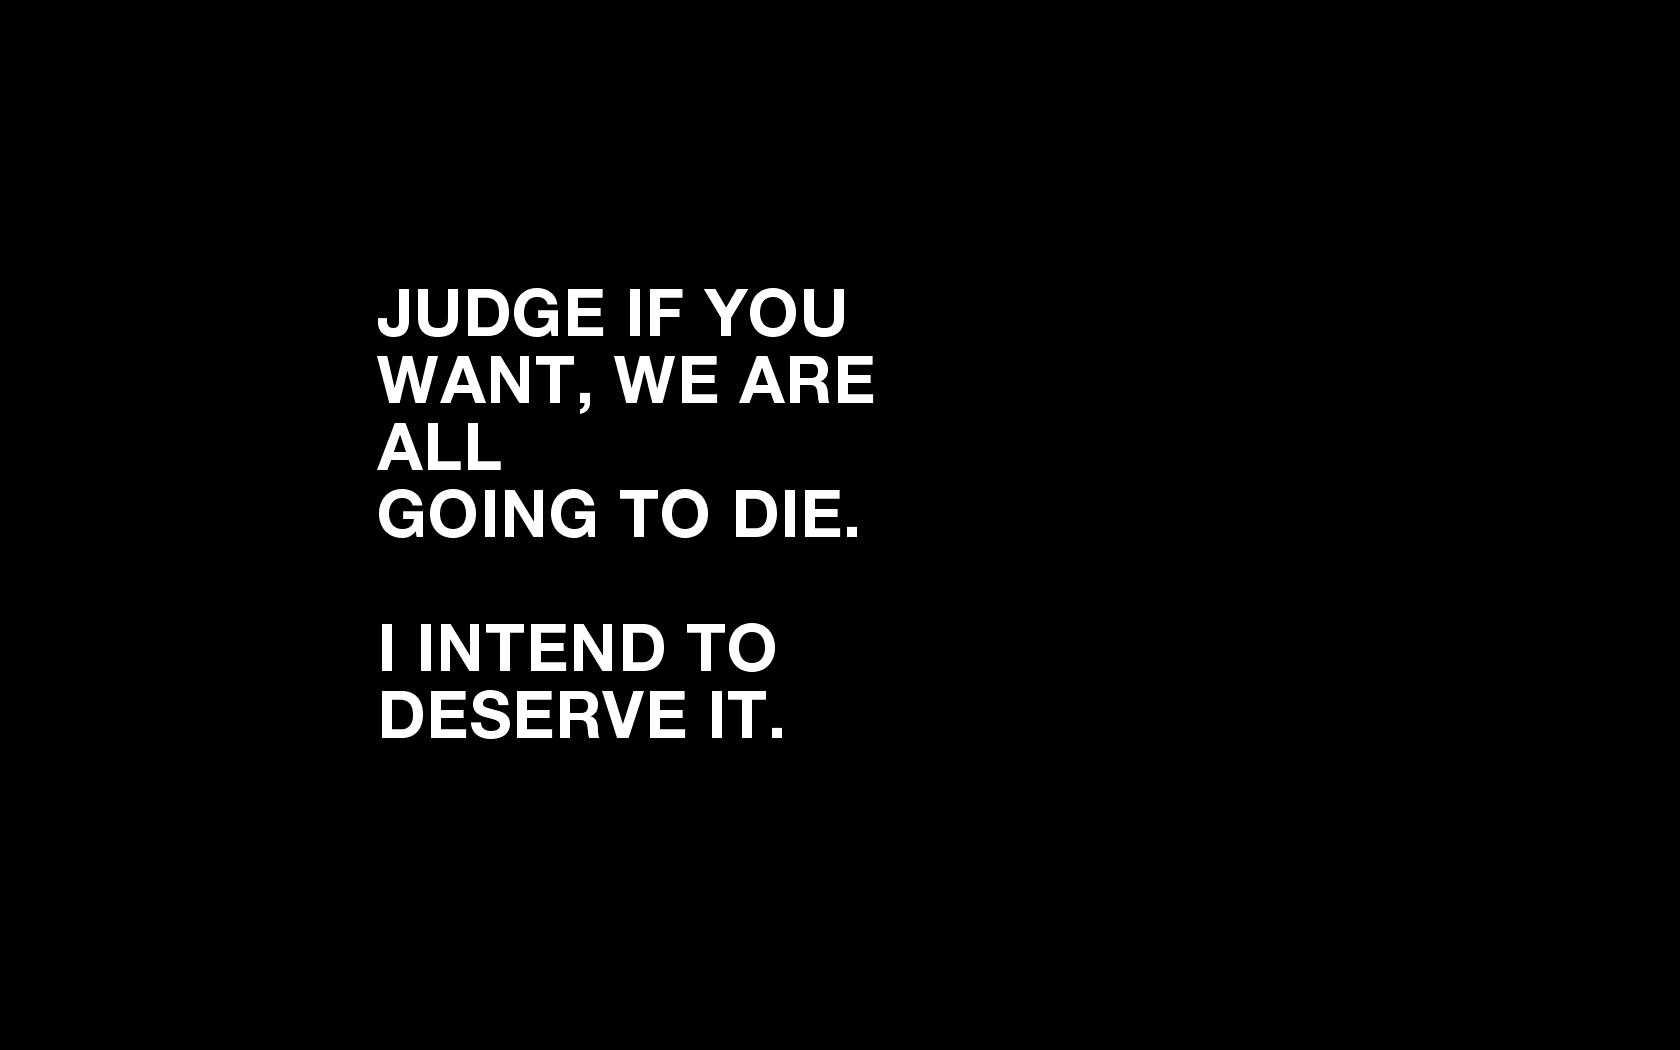 Emo Quotes About Suicide: Emo Death Quotes. QuotesGram